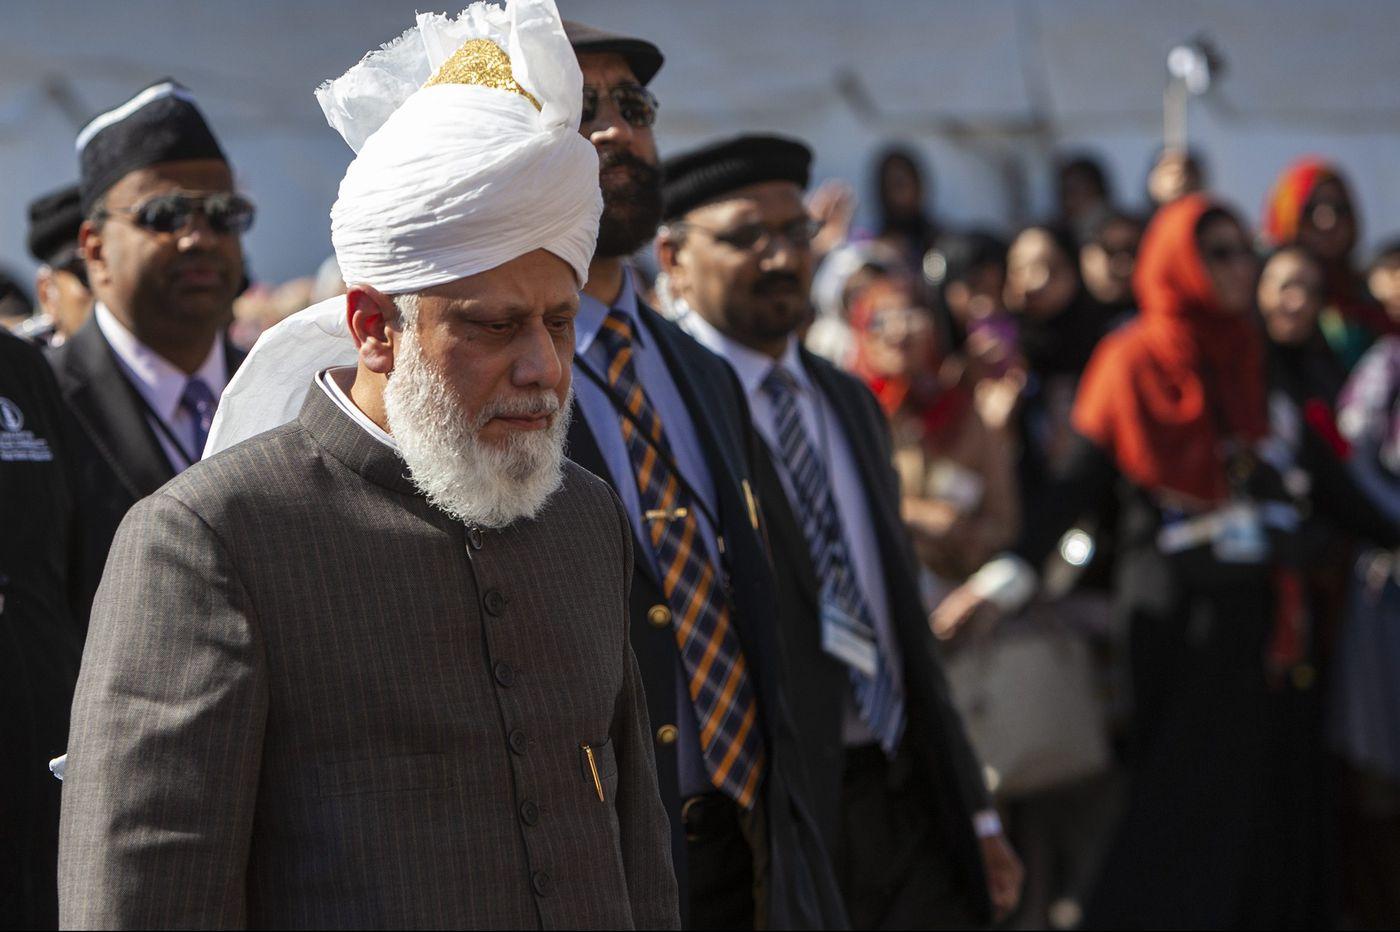 The Ahmadiyya Muslim Community's 'pope' visits to dedicate a mosque in North Philadelphia